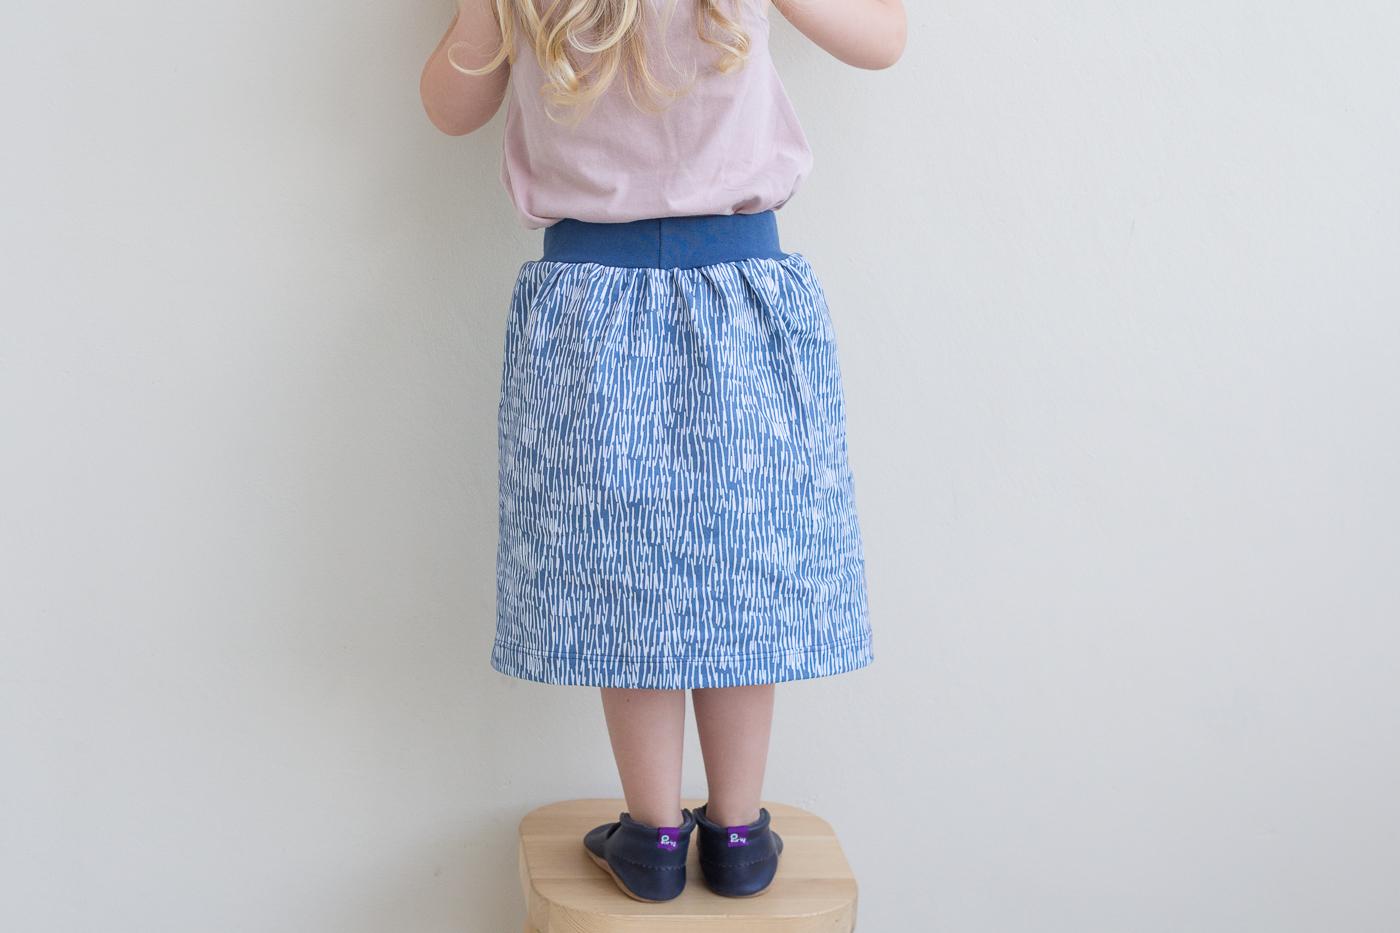 panther rain skirt about blue fabrics